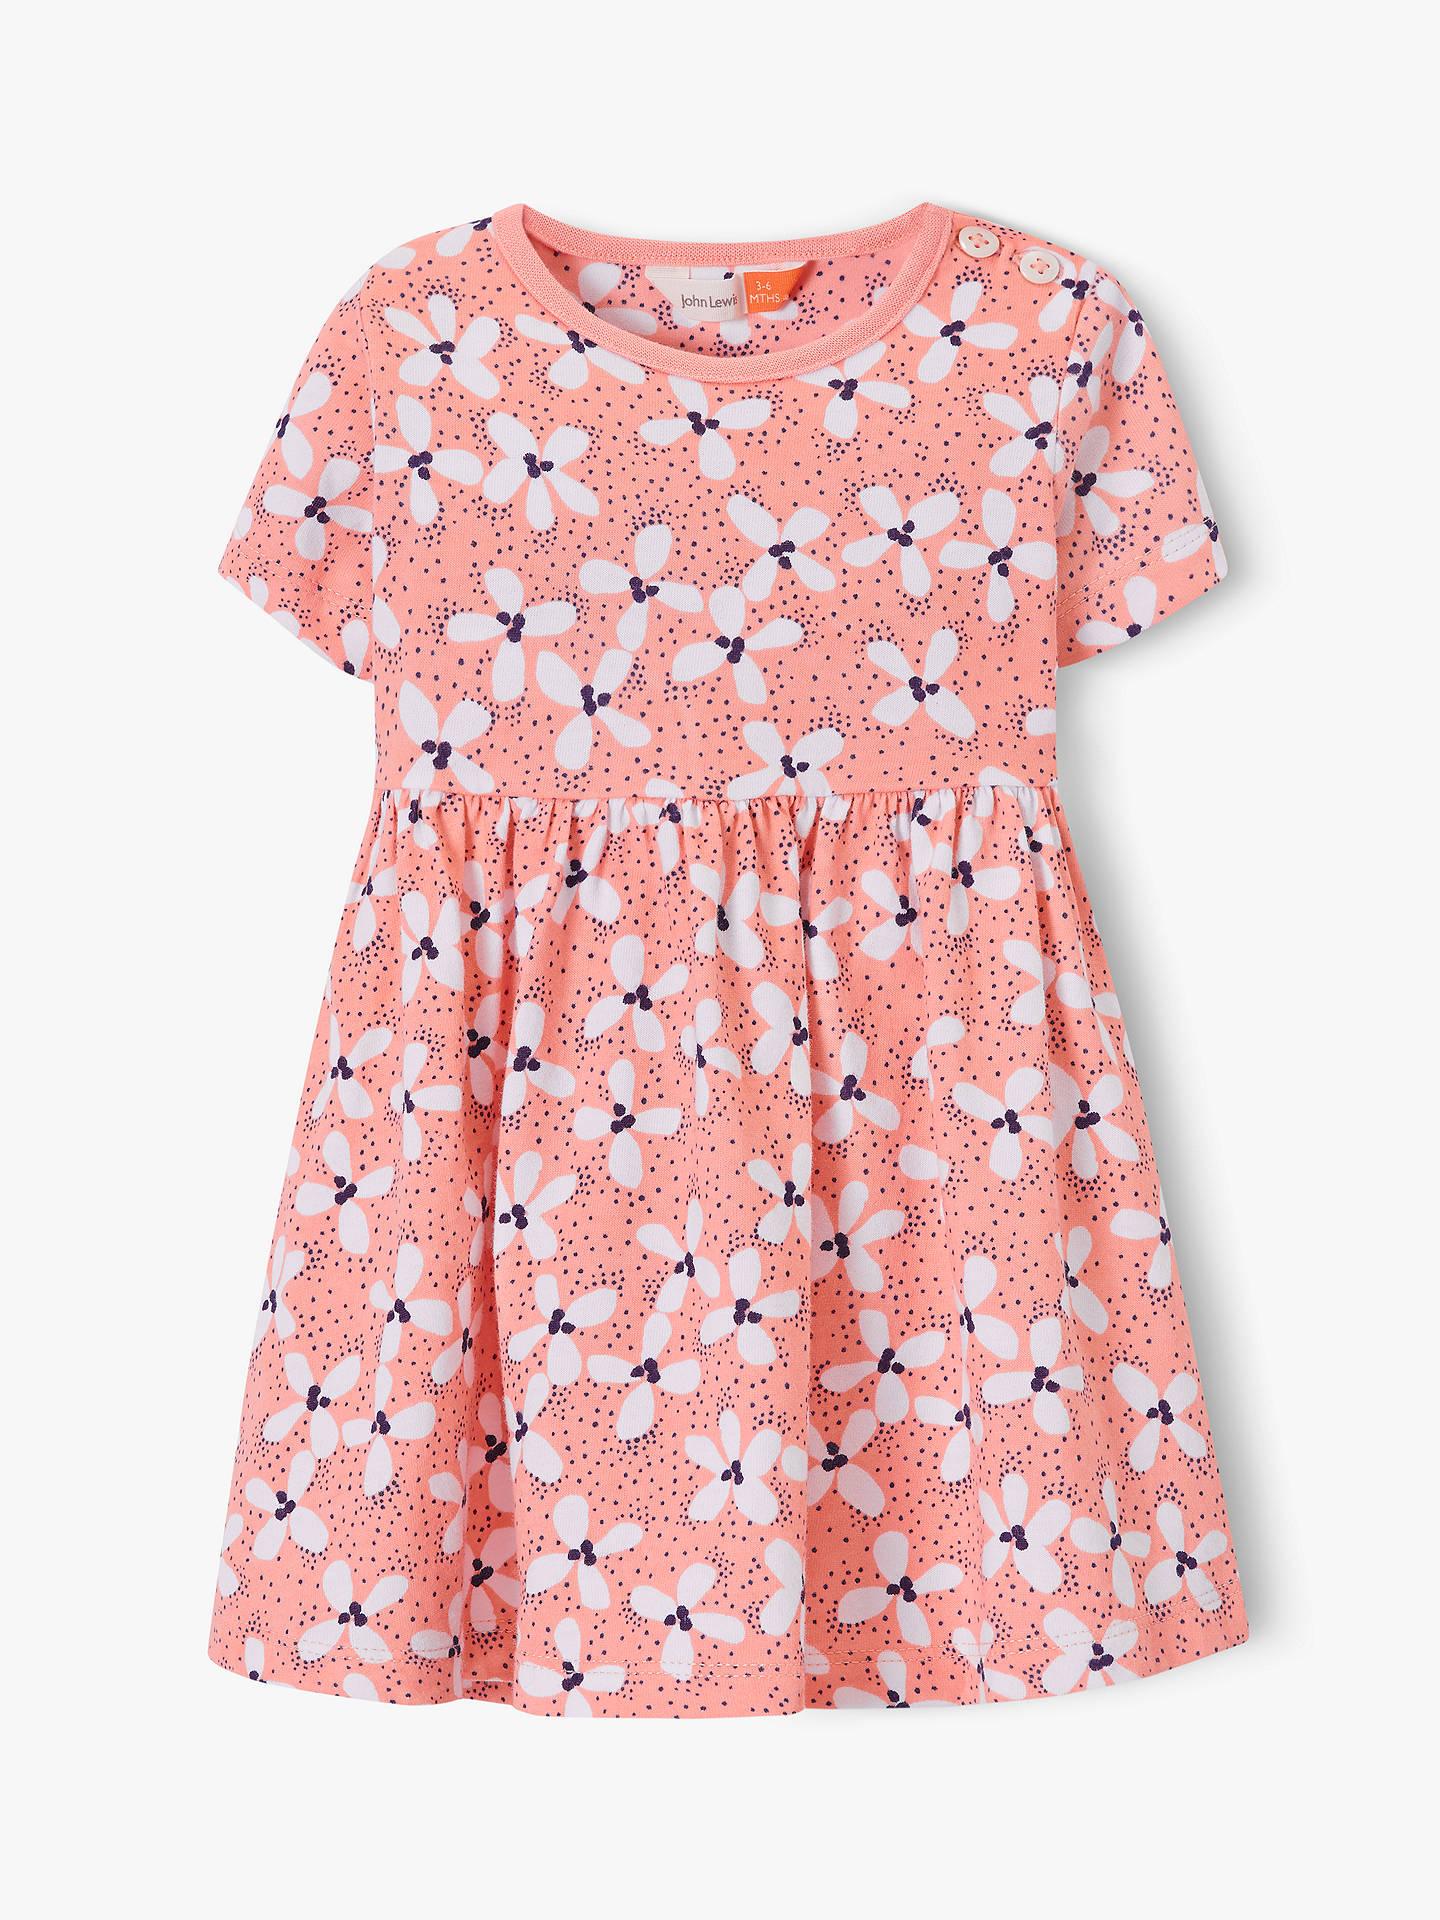 465e6f197 Buy John Lewis & Partners Baby GOTS Organic Cotton Floral Jersey Dress,  Pink, 2 ...